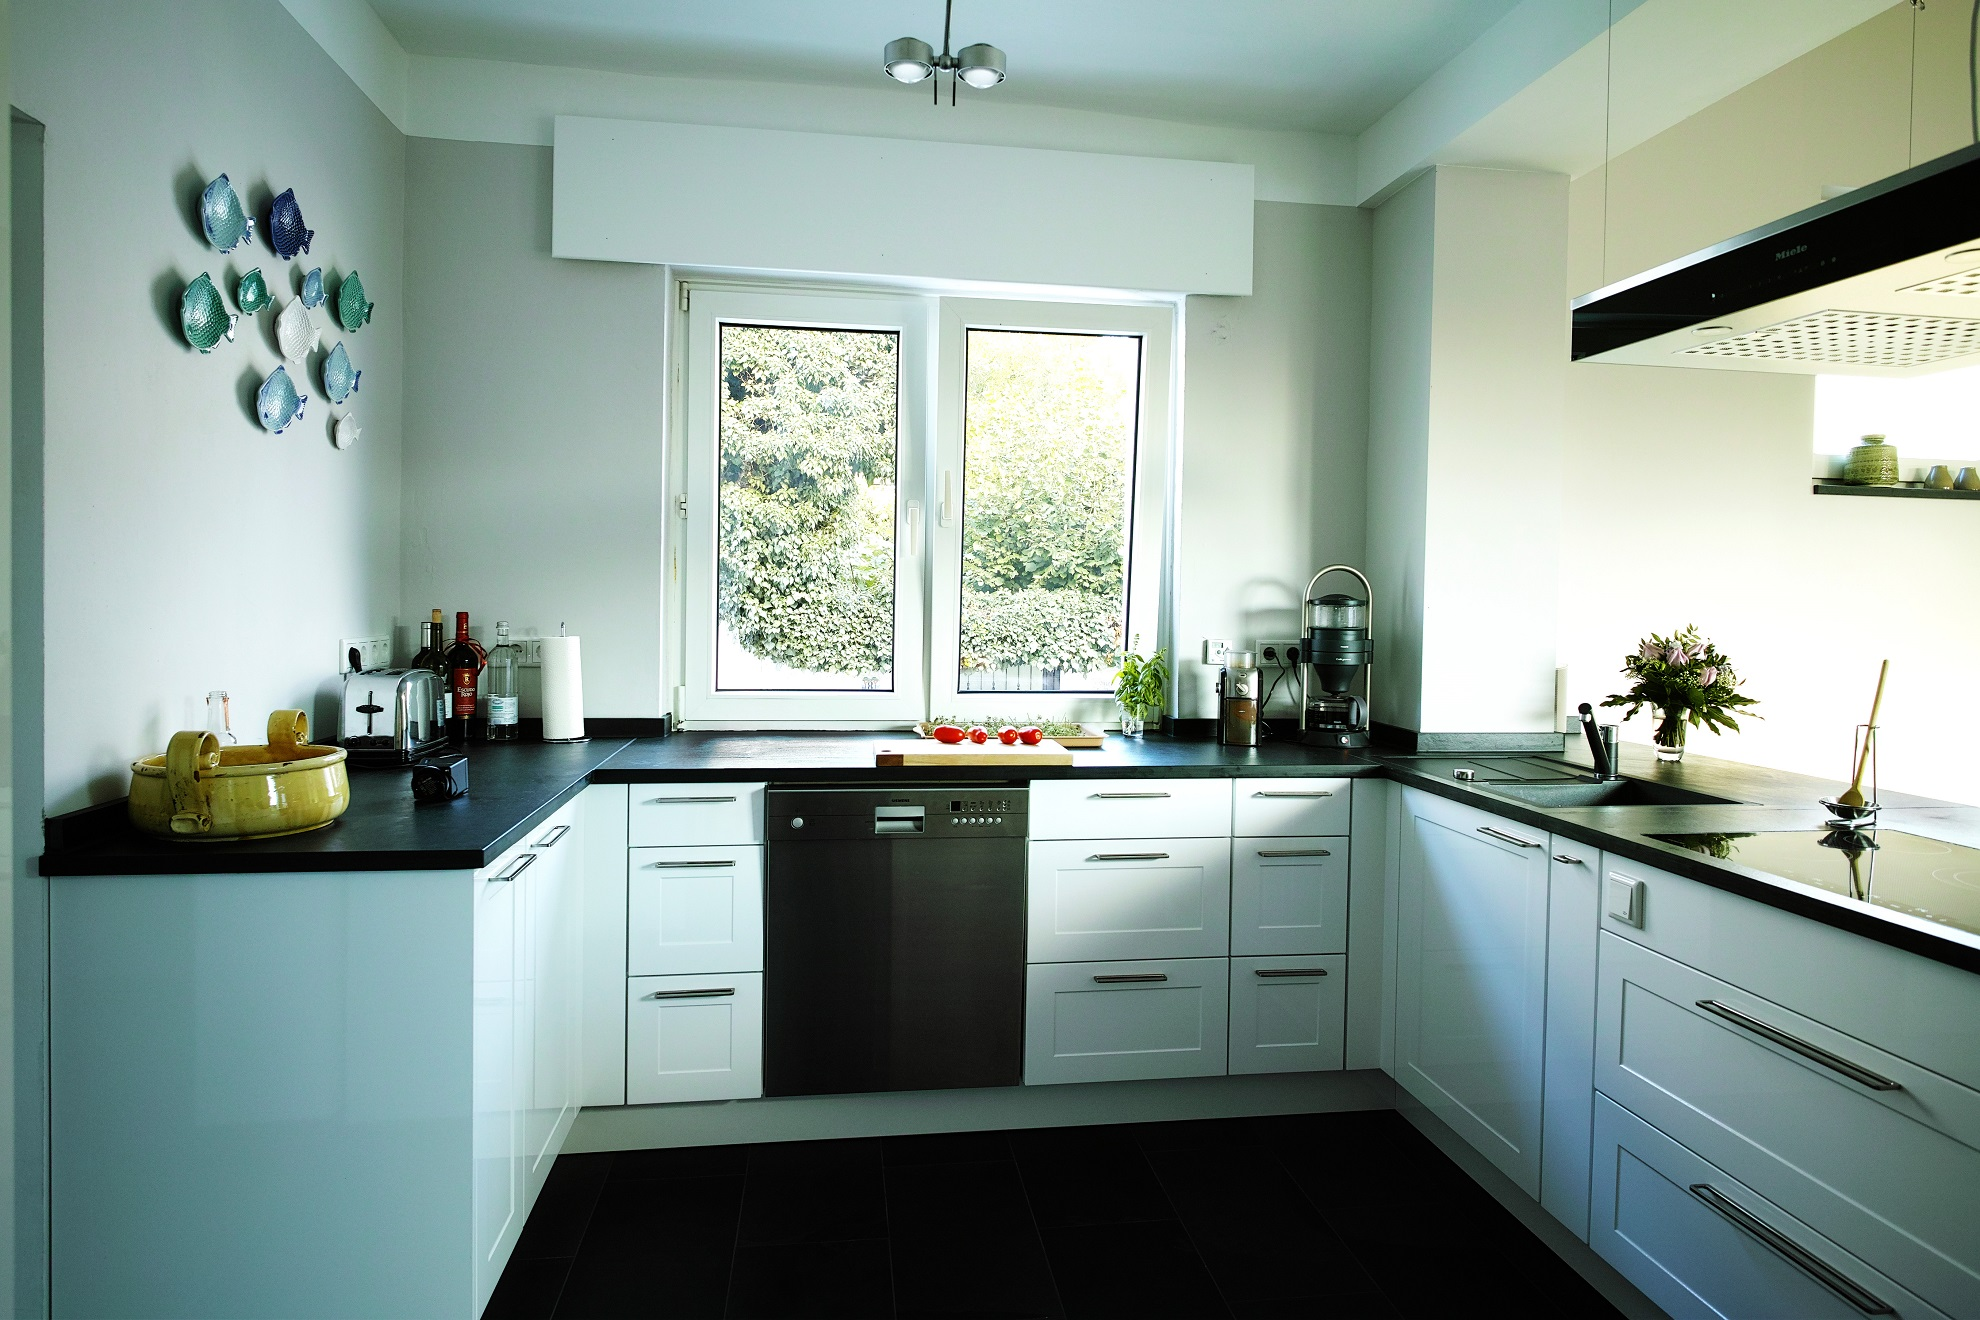 schiefer schieferblog blog erfahrung. Black Bedroom Furniture Sets. Home Design Ideas